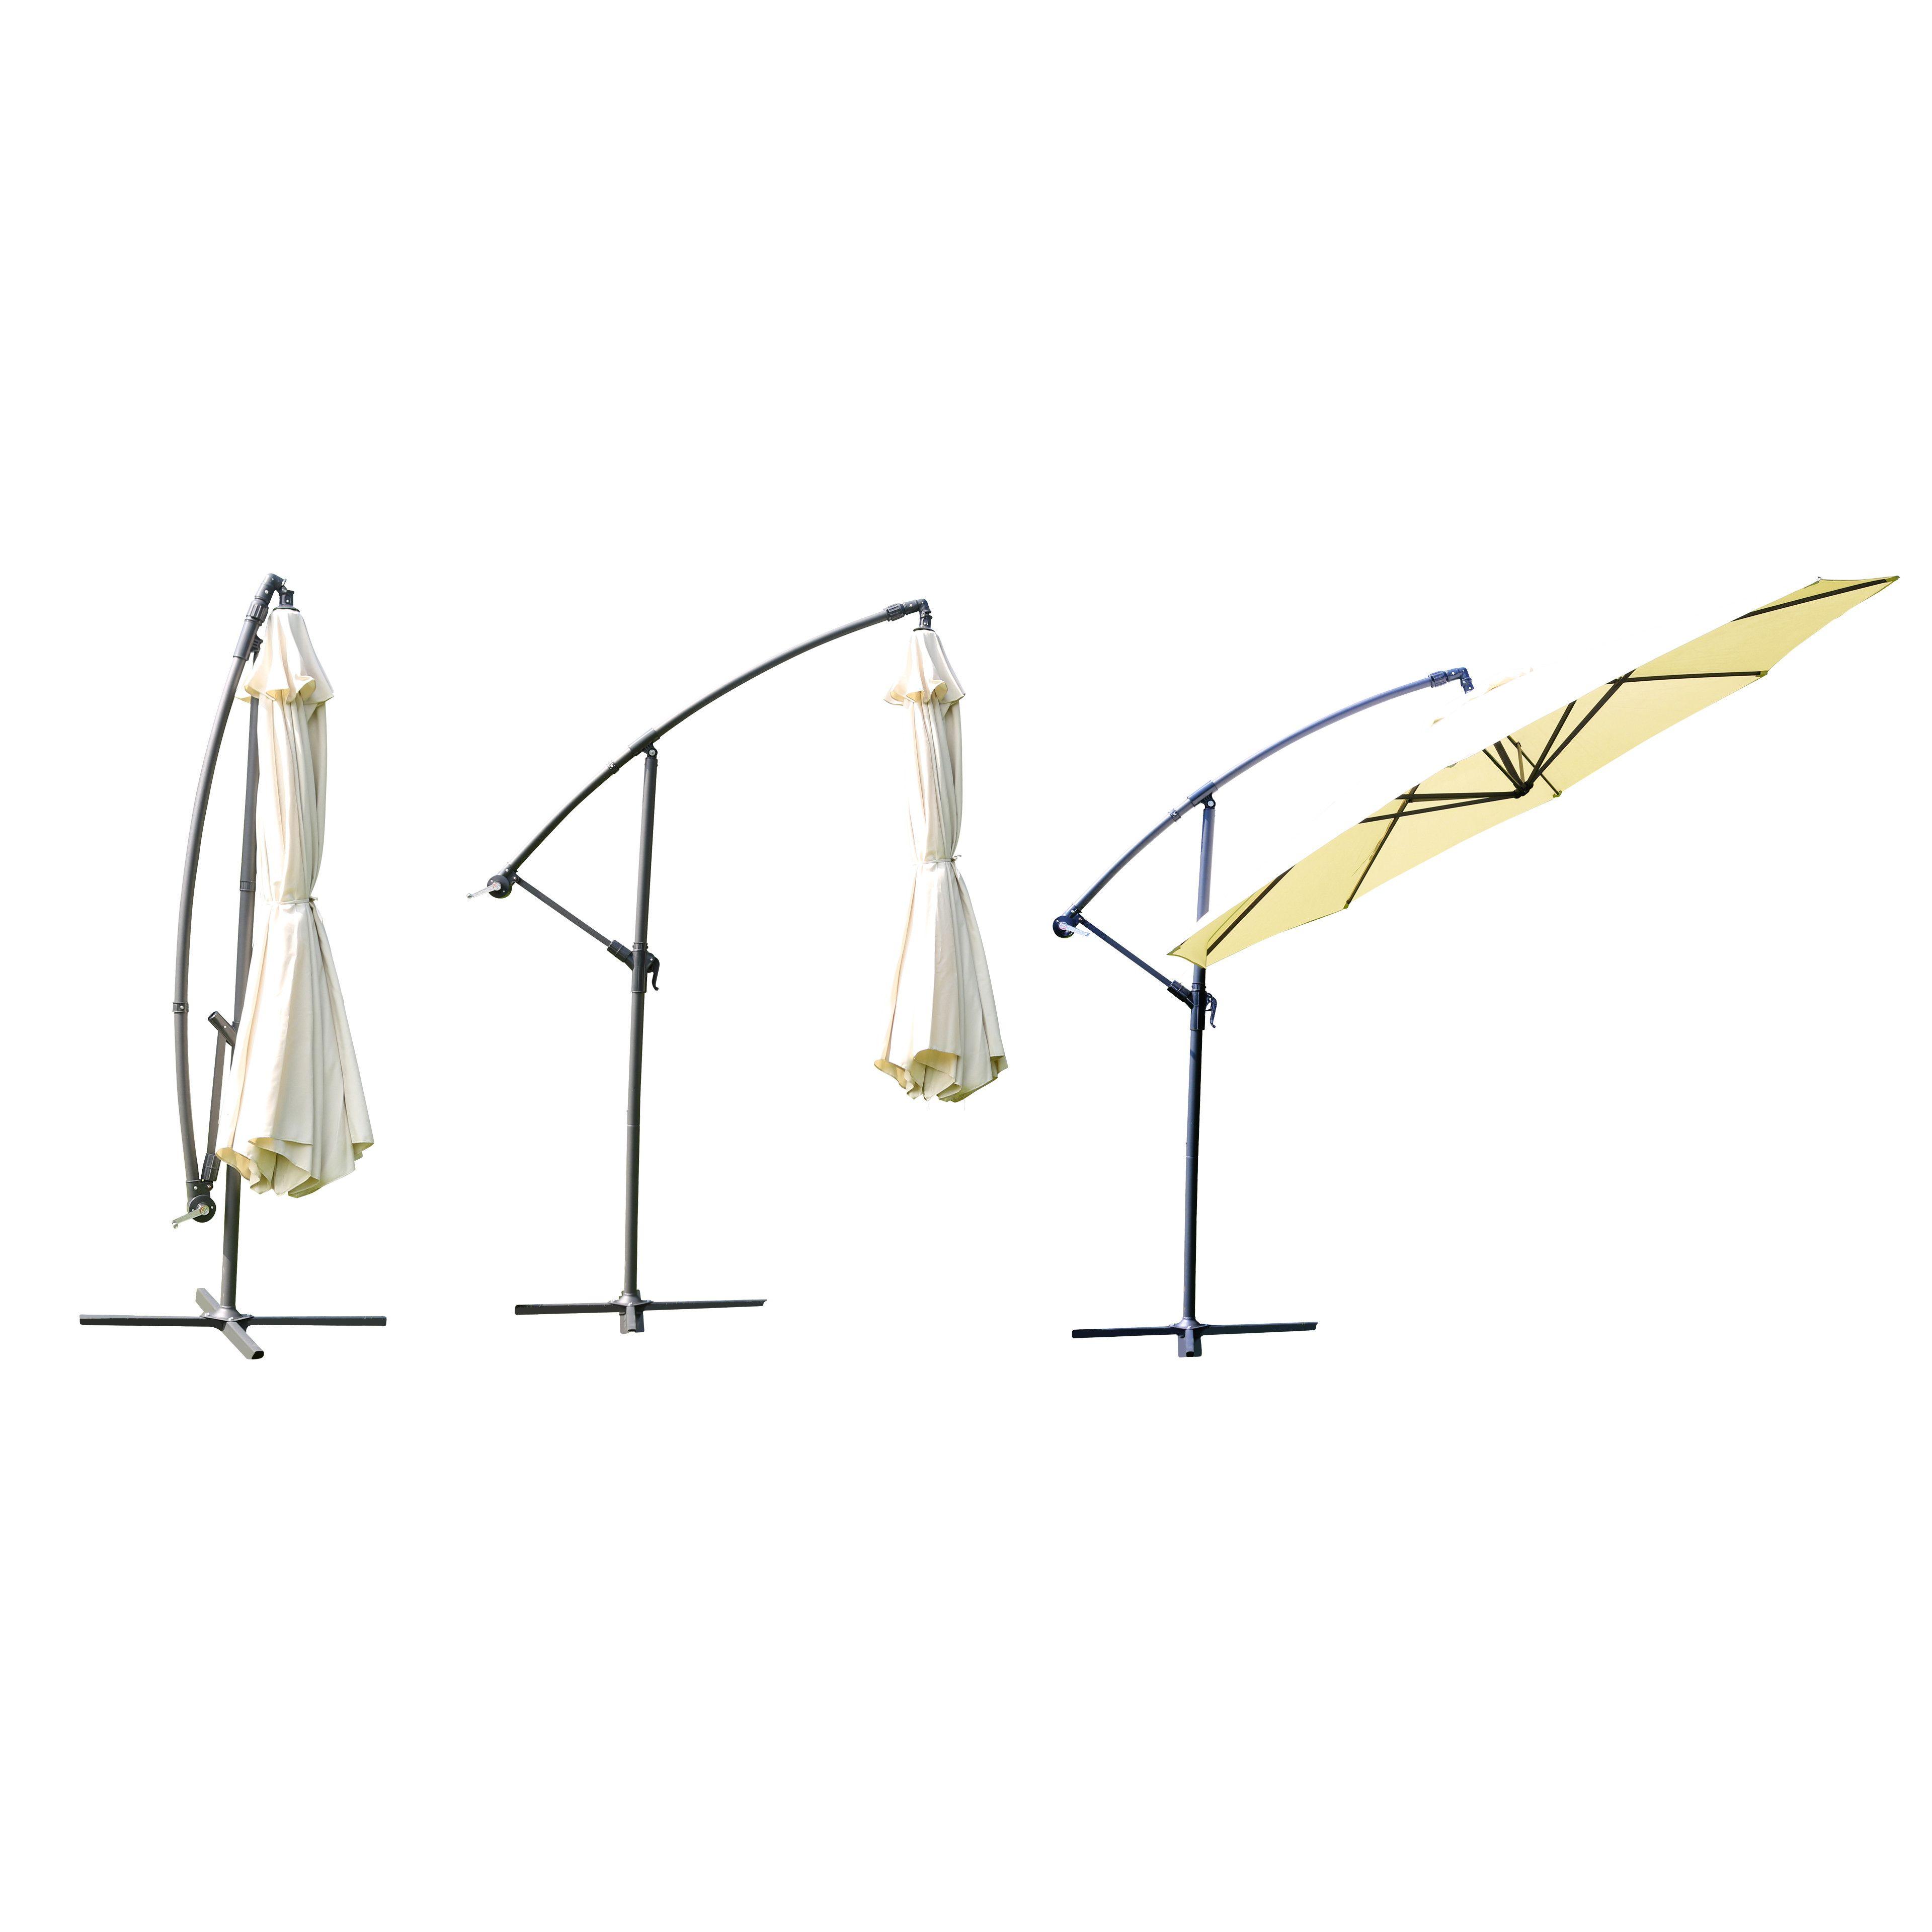 parasol 3 5 meter simple parasol belvedere m round white. Black Bedroom Furniture Sets. Home Design Ideas